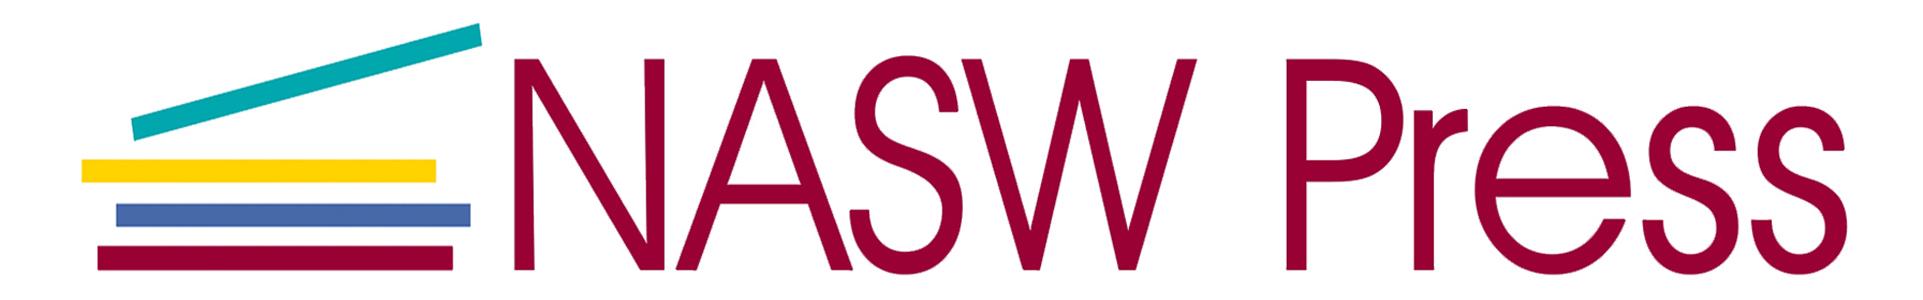 Image: NASW Press logo